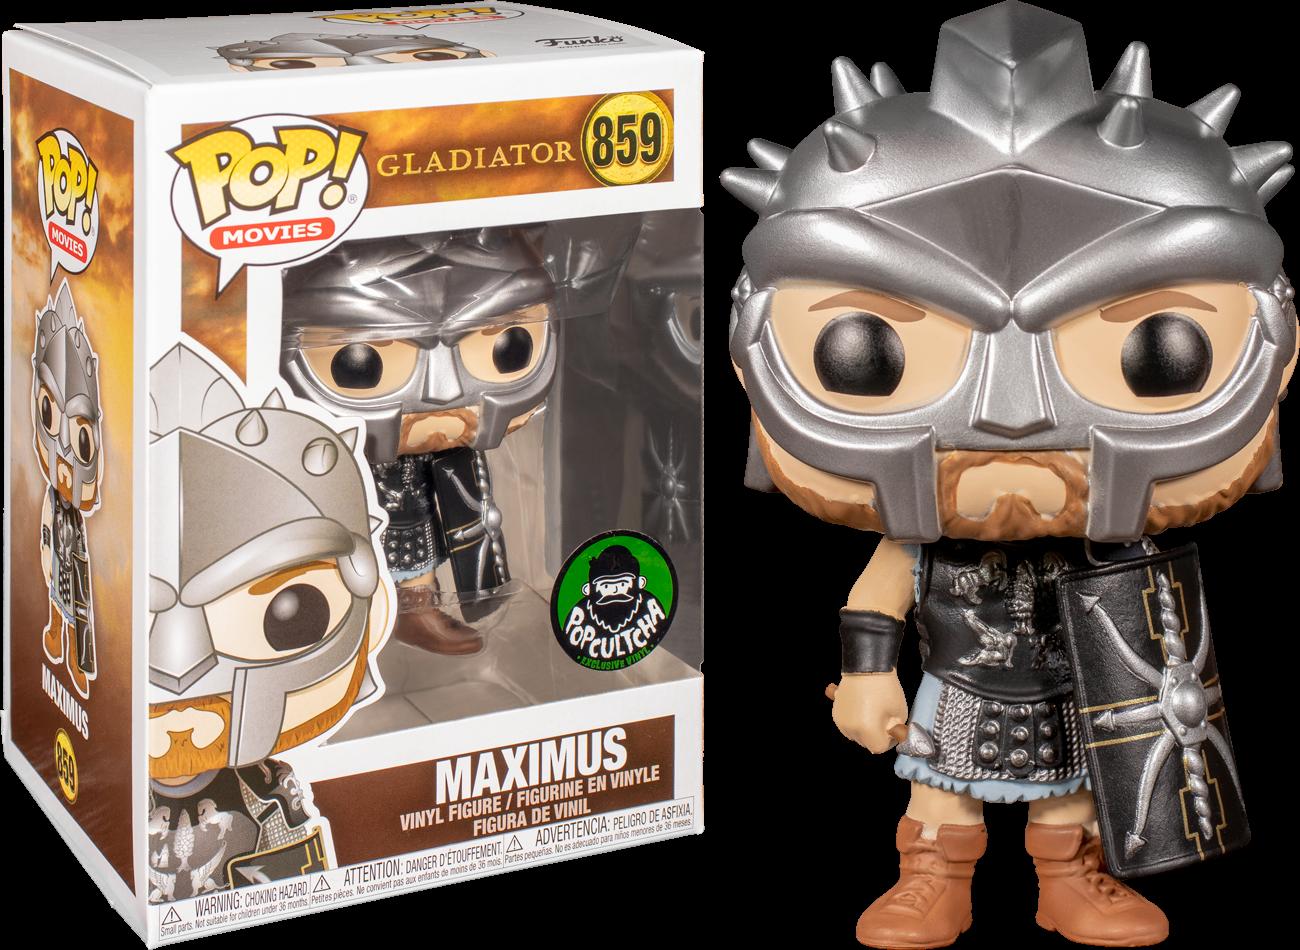 Gladiator - Maximus with Helmet Pop! Vinyl Figure